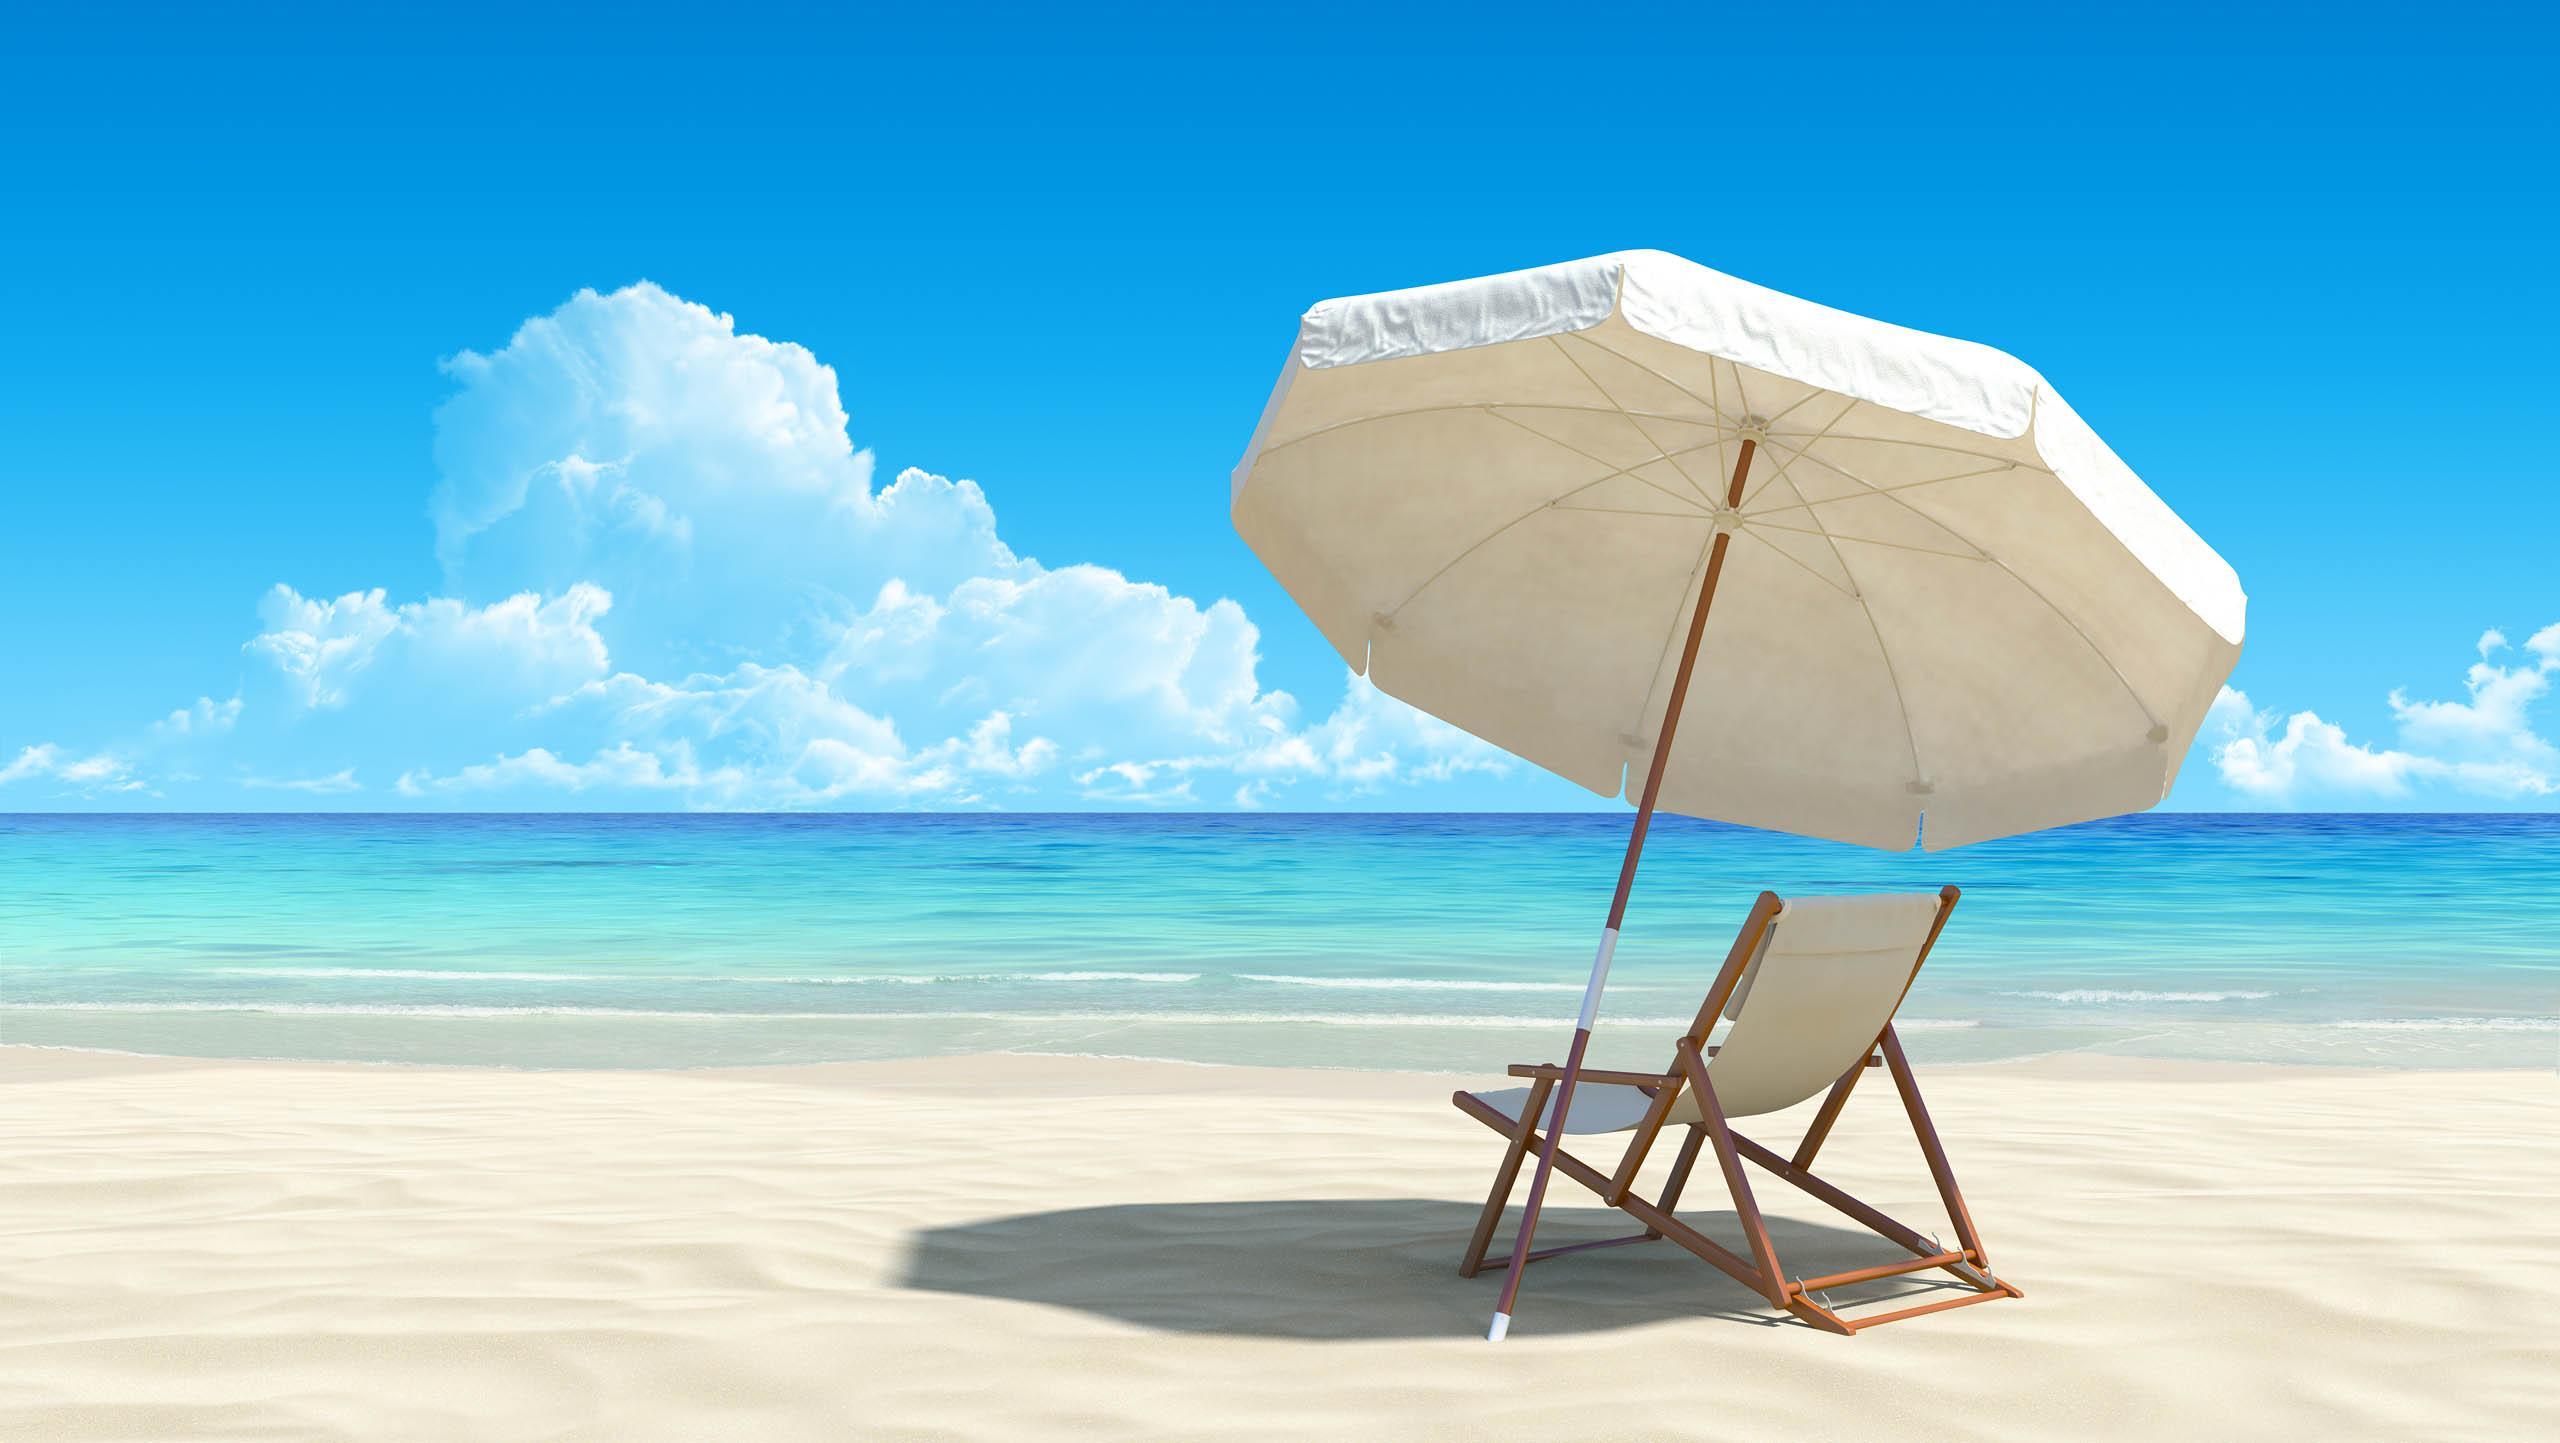 chair-on-beach-with-beautiful-umbrella-1.jpg